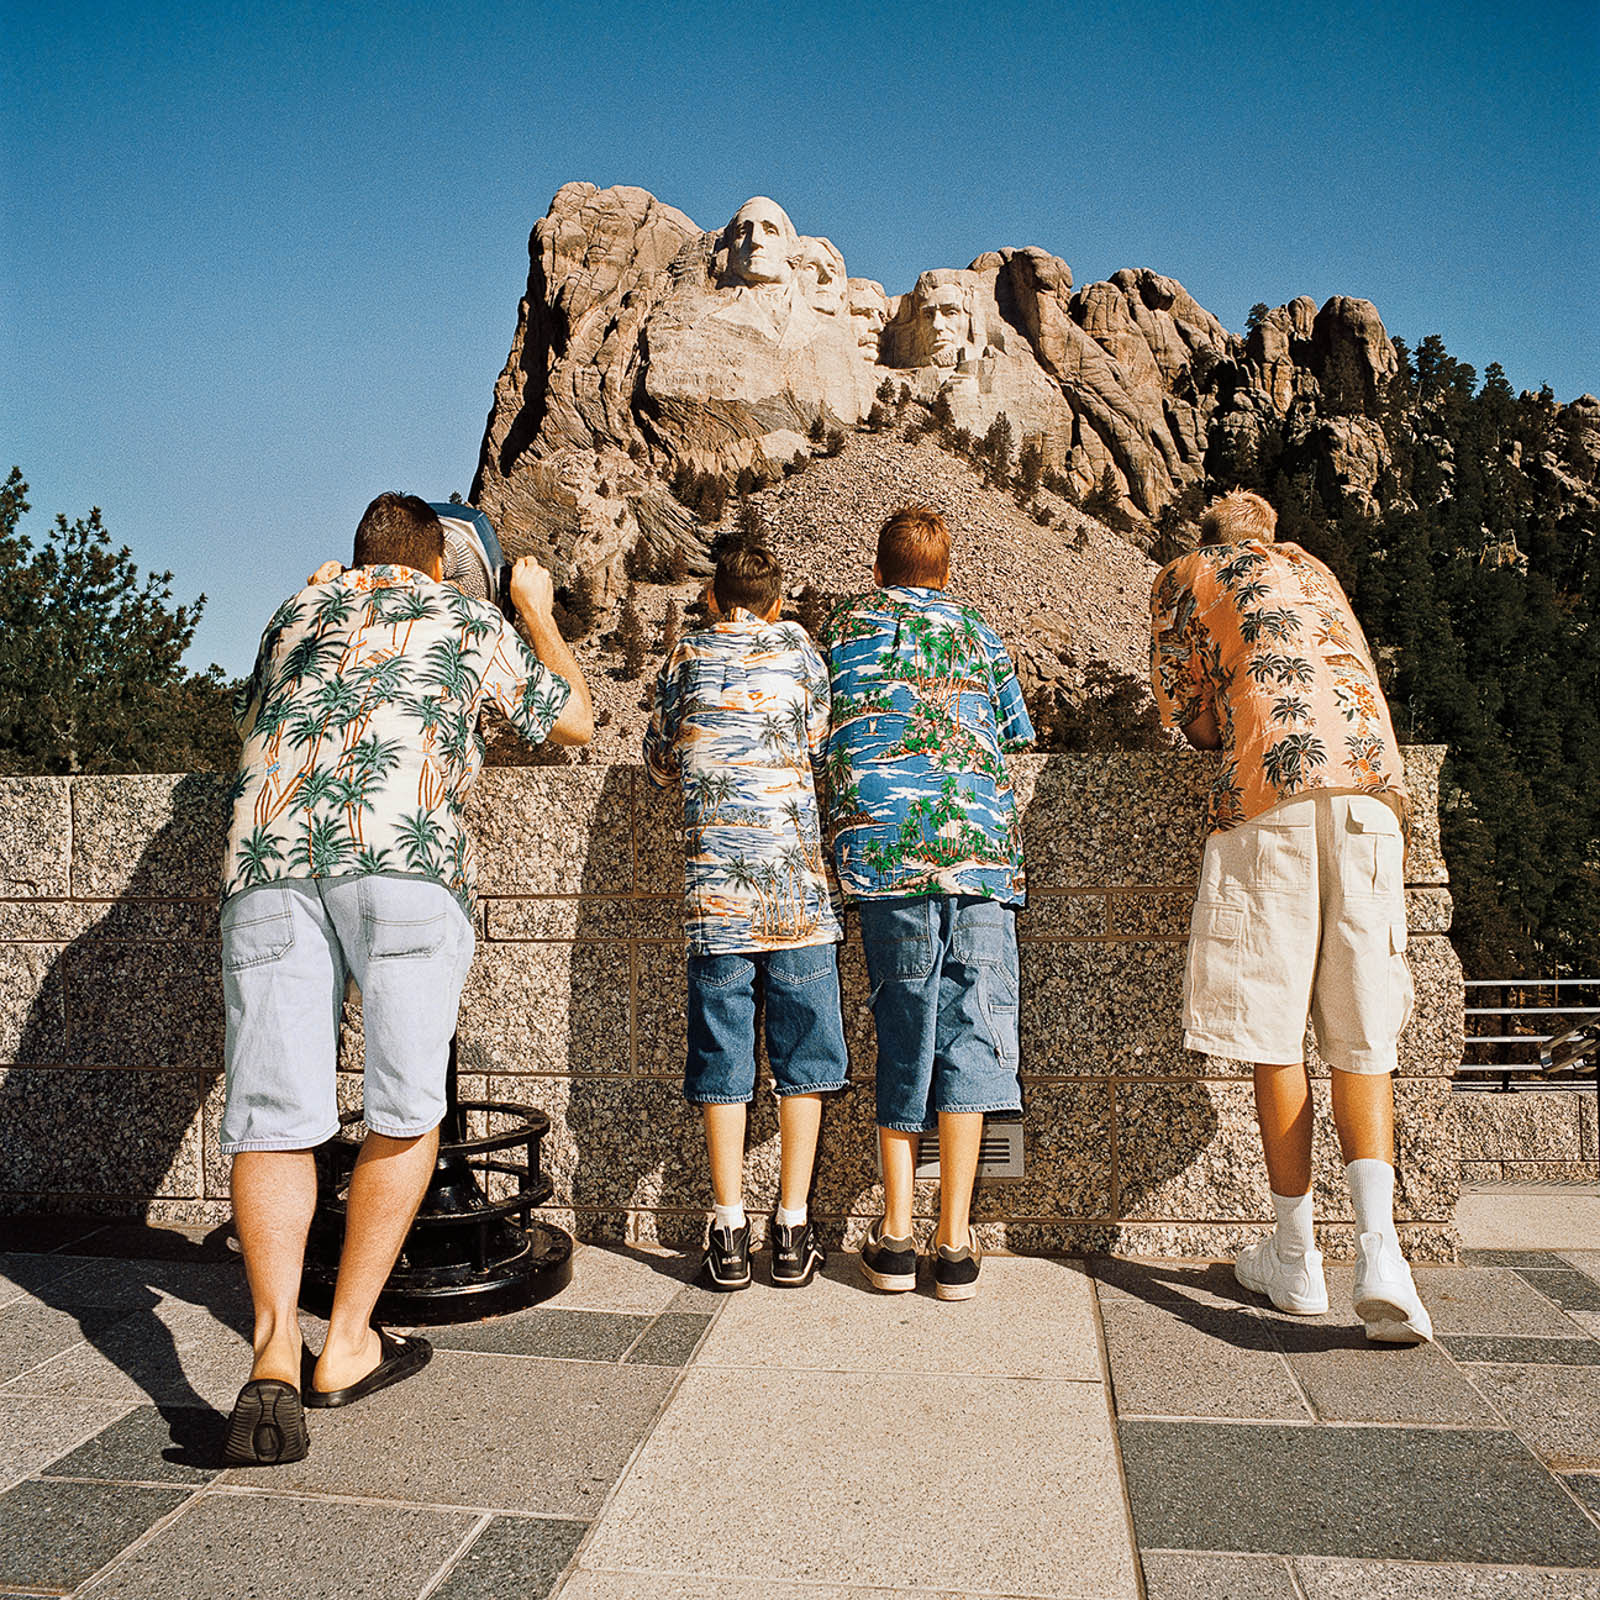 Family Viewing Mt Rushmore, South Dakota 1998